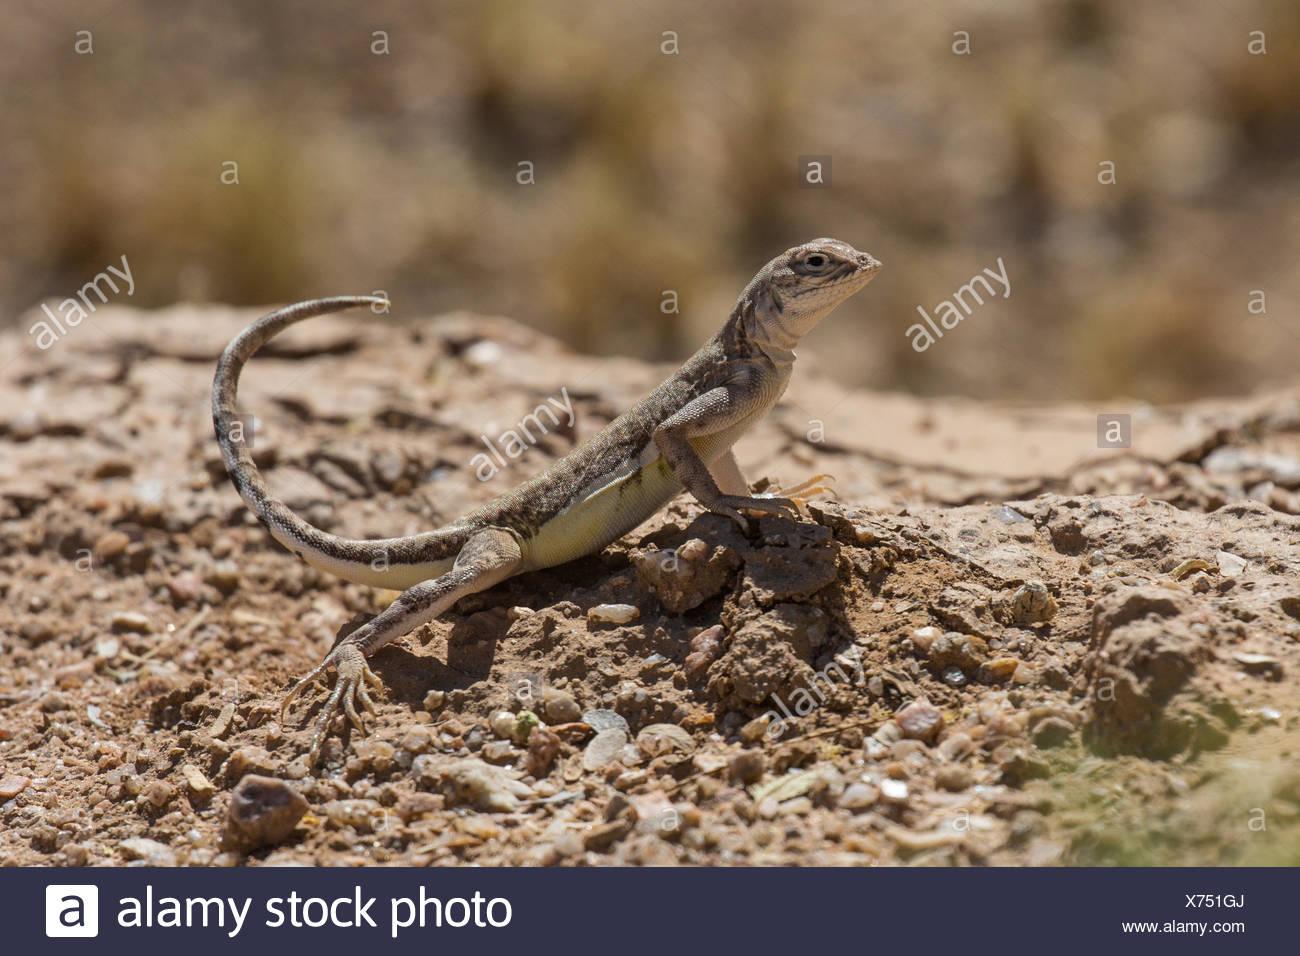 Zebratail lizard, Zebra-tailed lizard (Callisaurus draconoides), stretching the tail upwards, USA, Arizona, Sonoran - Stock Image